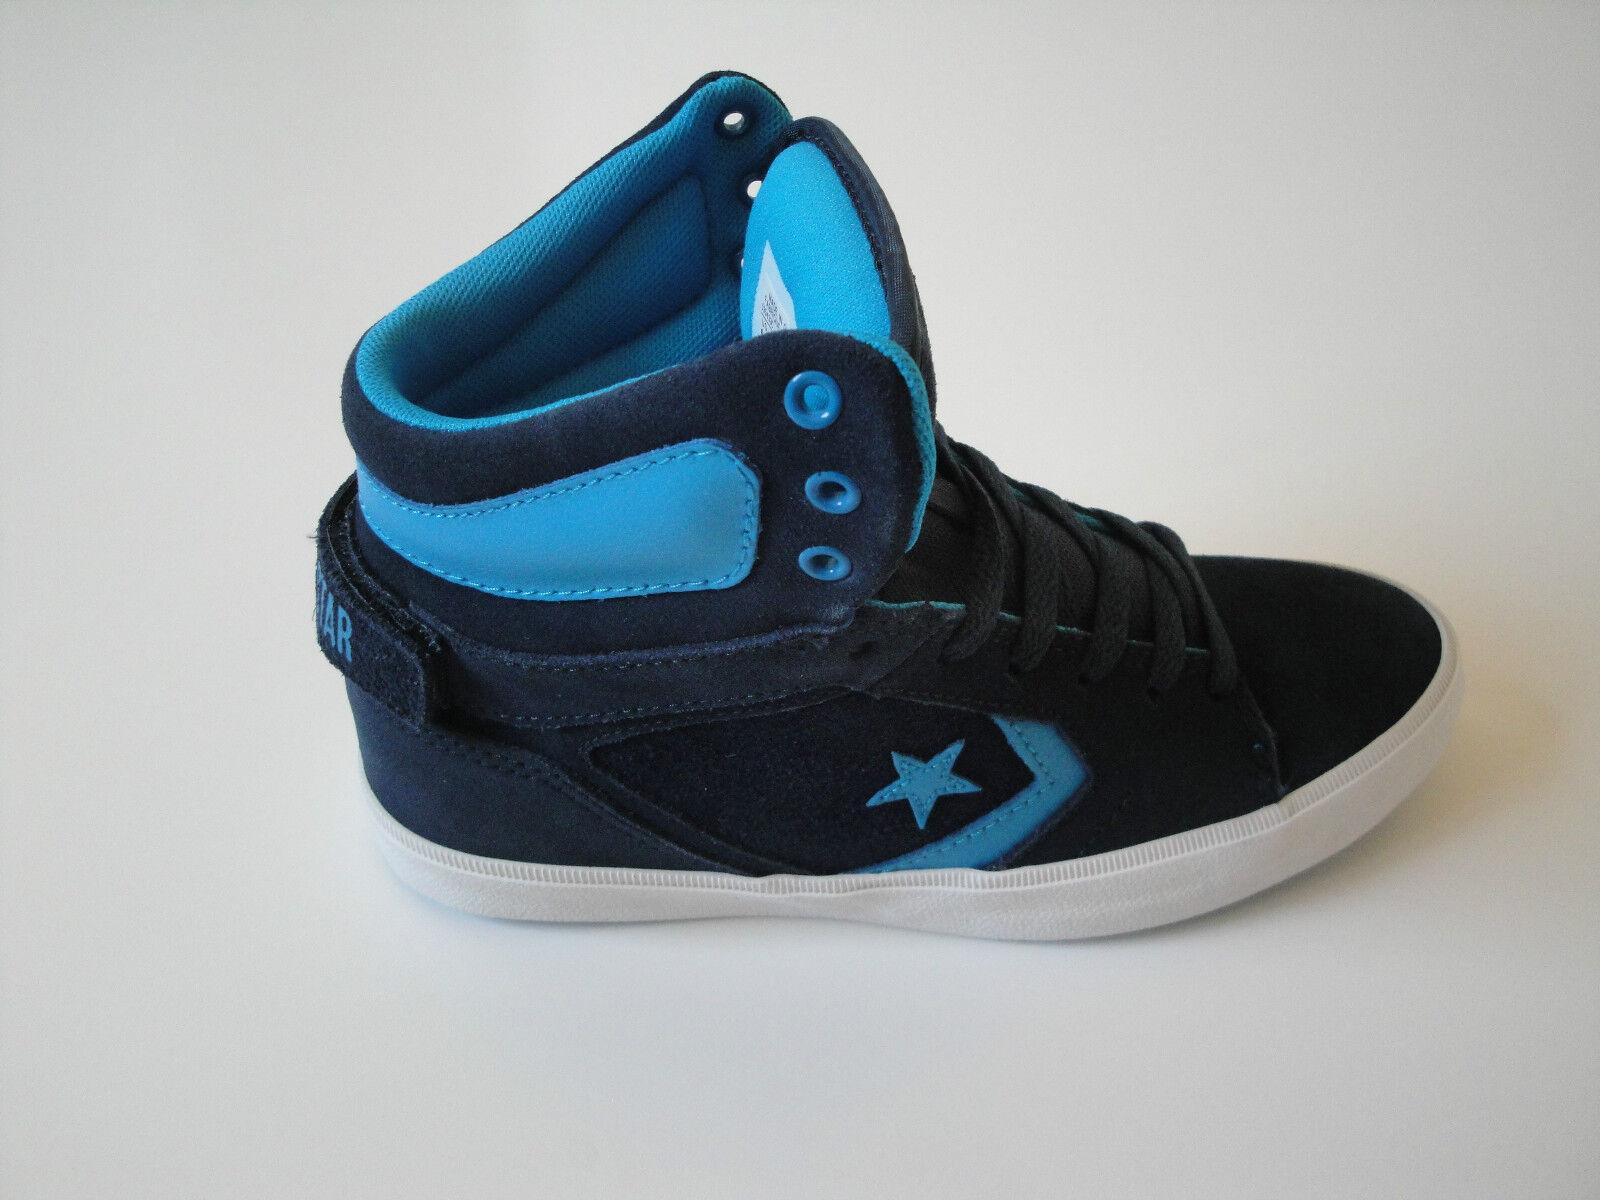 Converse Allstar 535433C 36,37  Damen Sneaker Gr. 36,37 535433C UK 3,5/4,5 b7f709